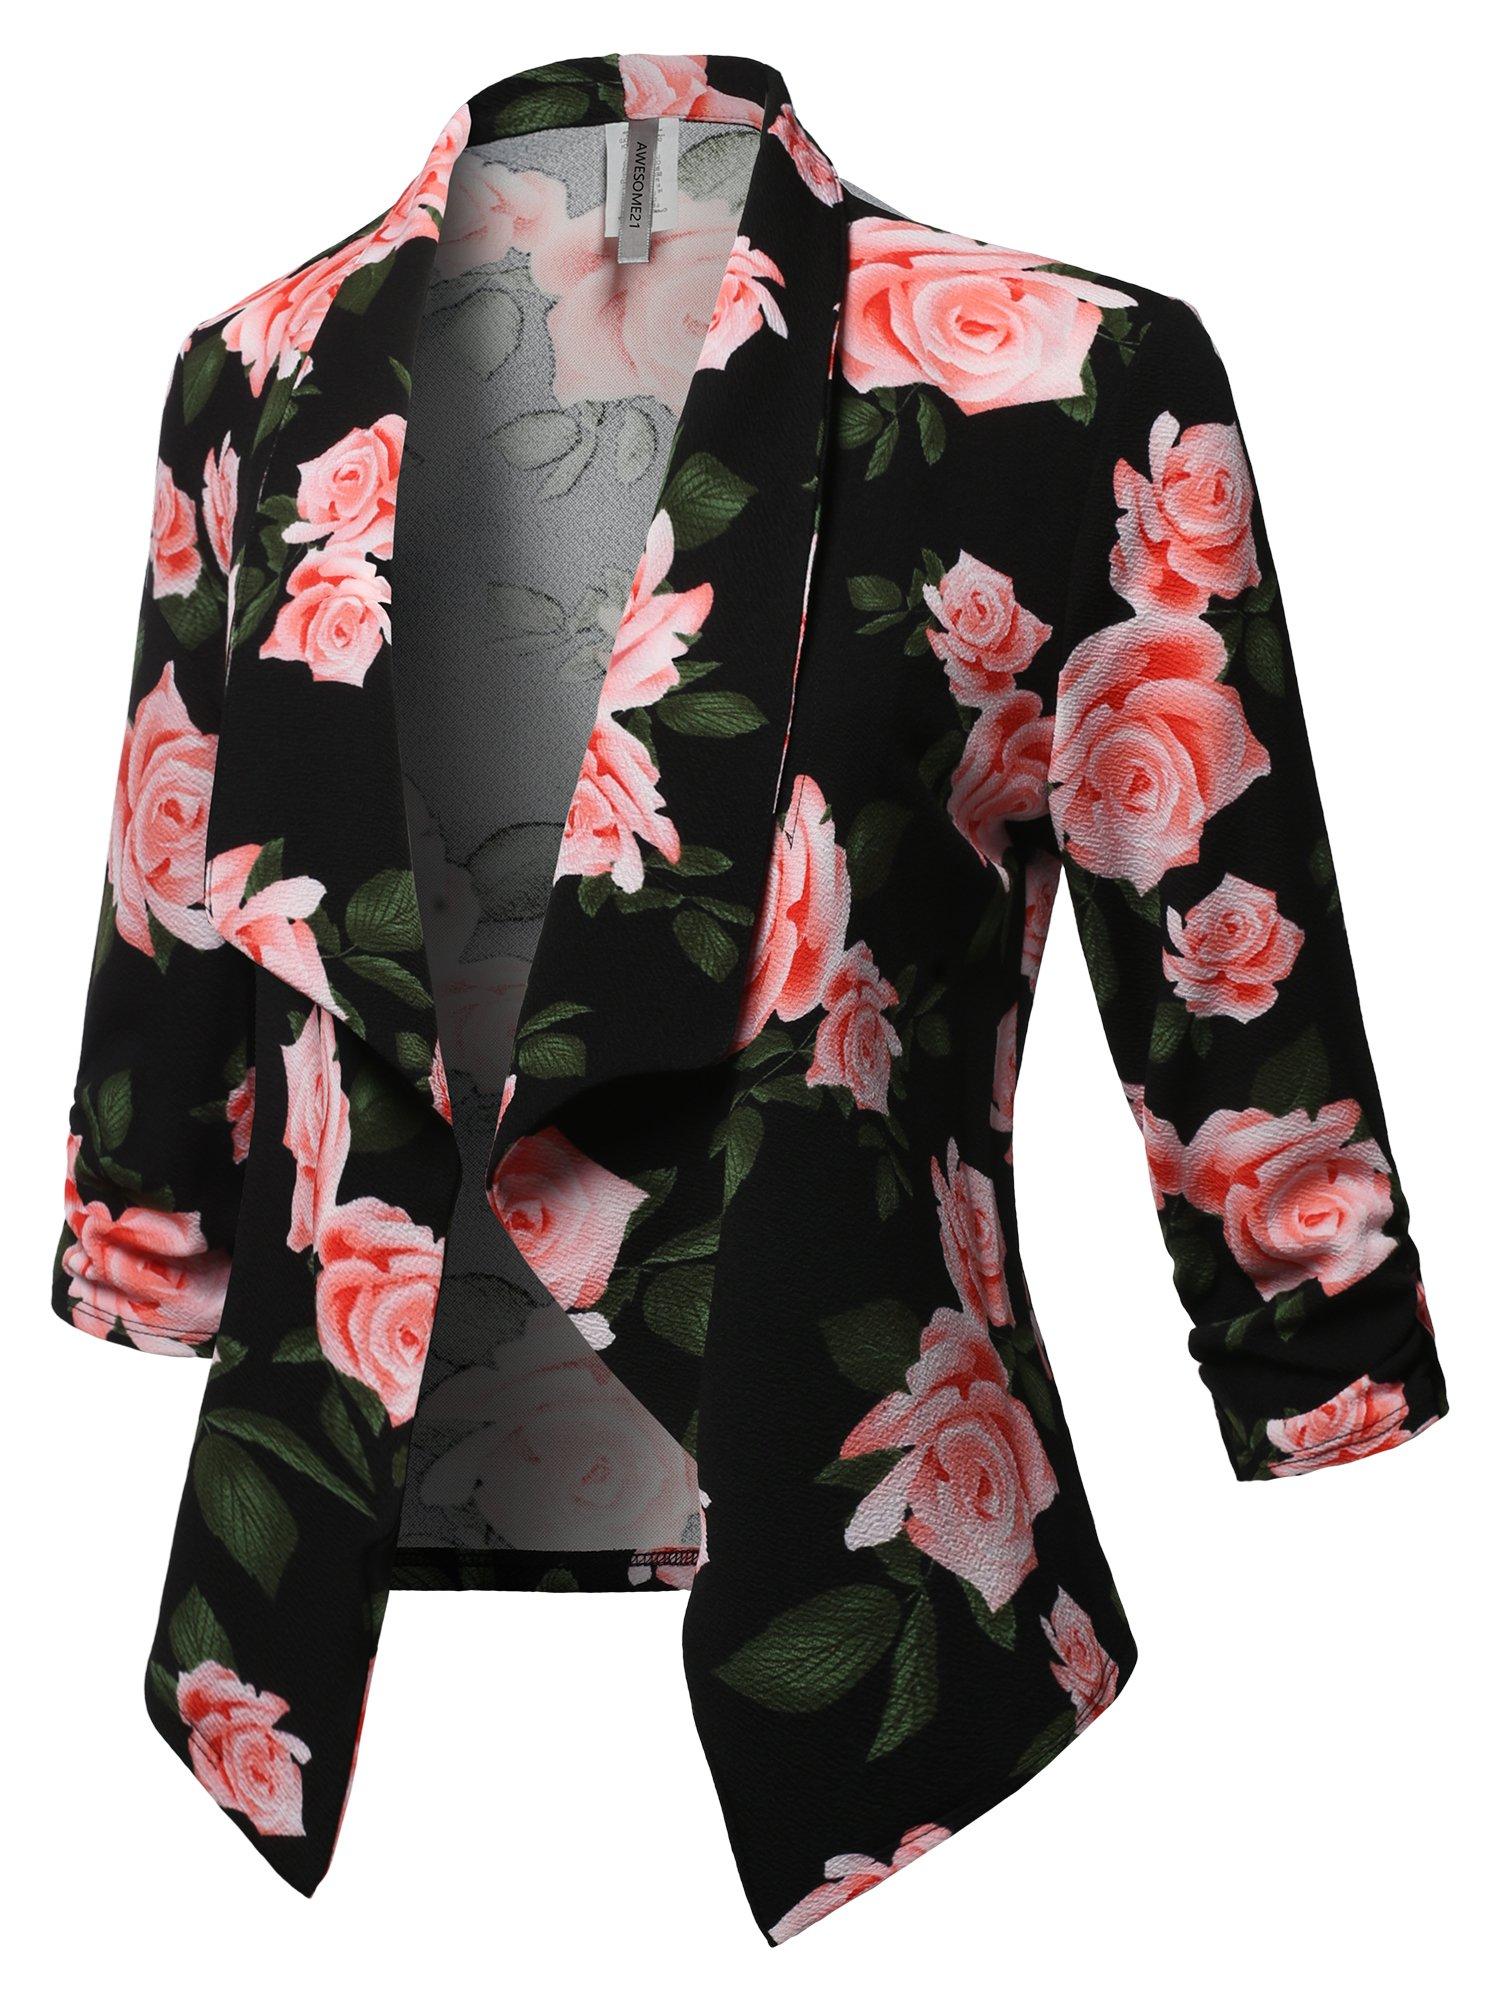 Awesome21 Stretch 3/4 Gathered Sleeve Open Blazer Jacket Black Peach Size S